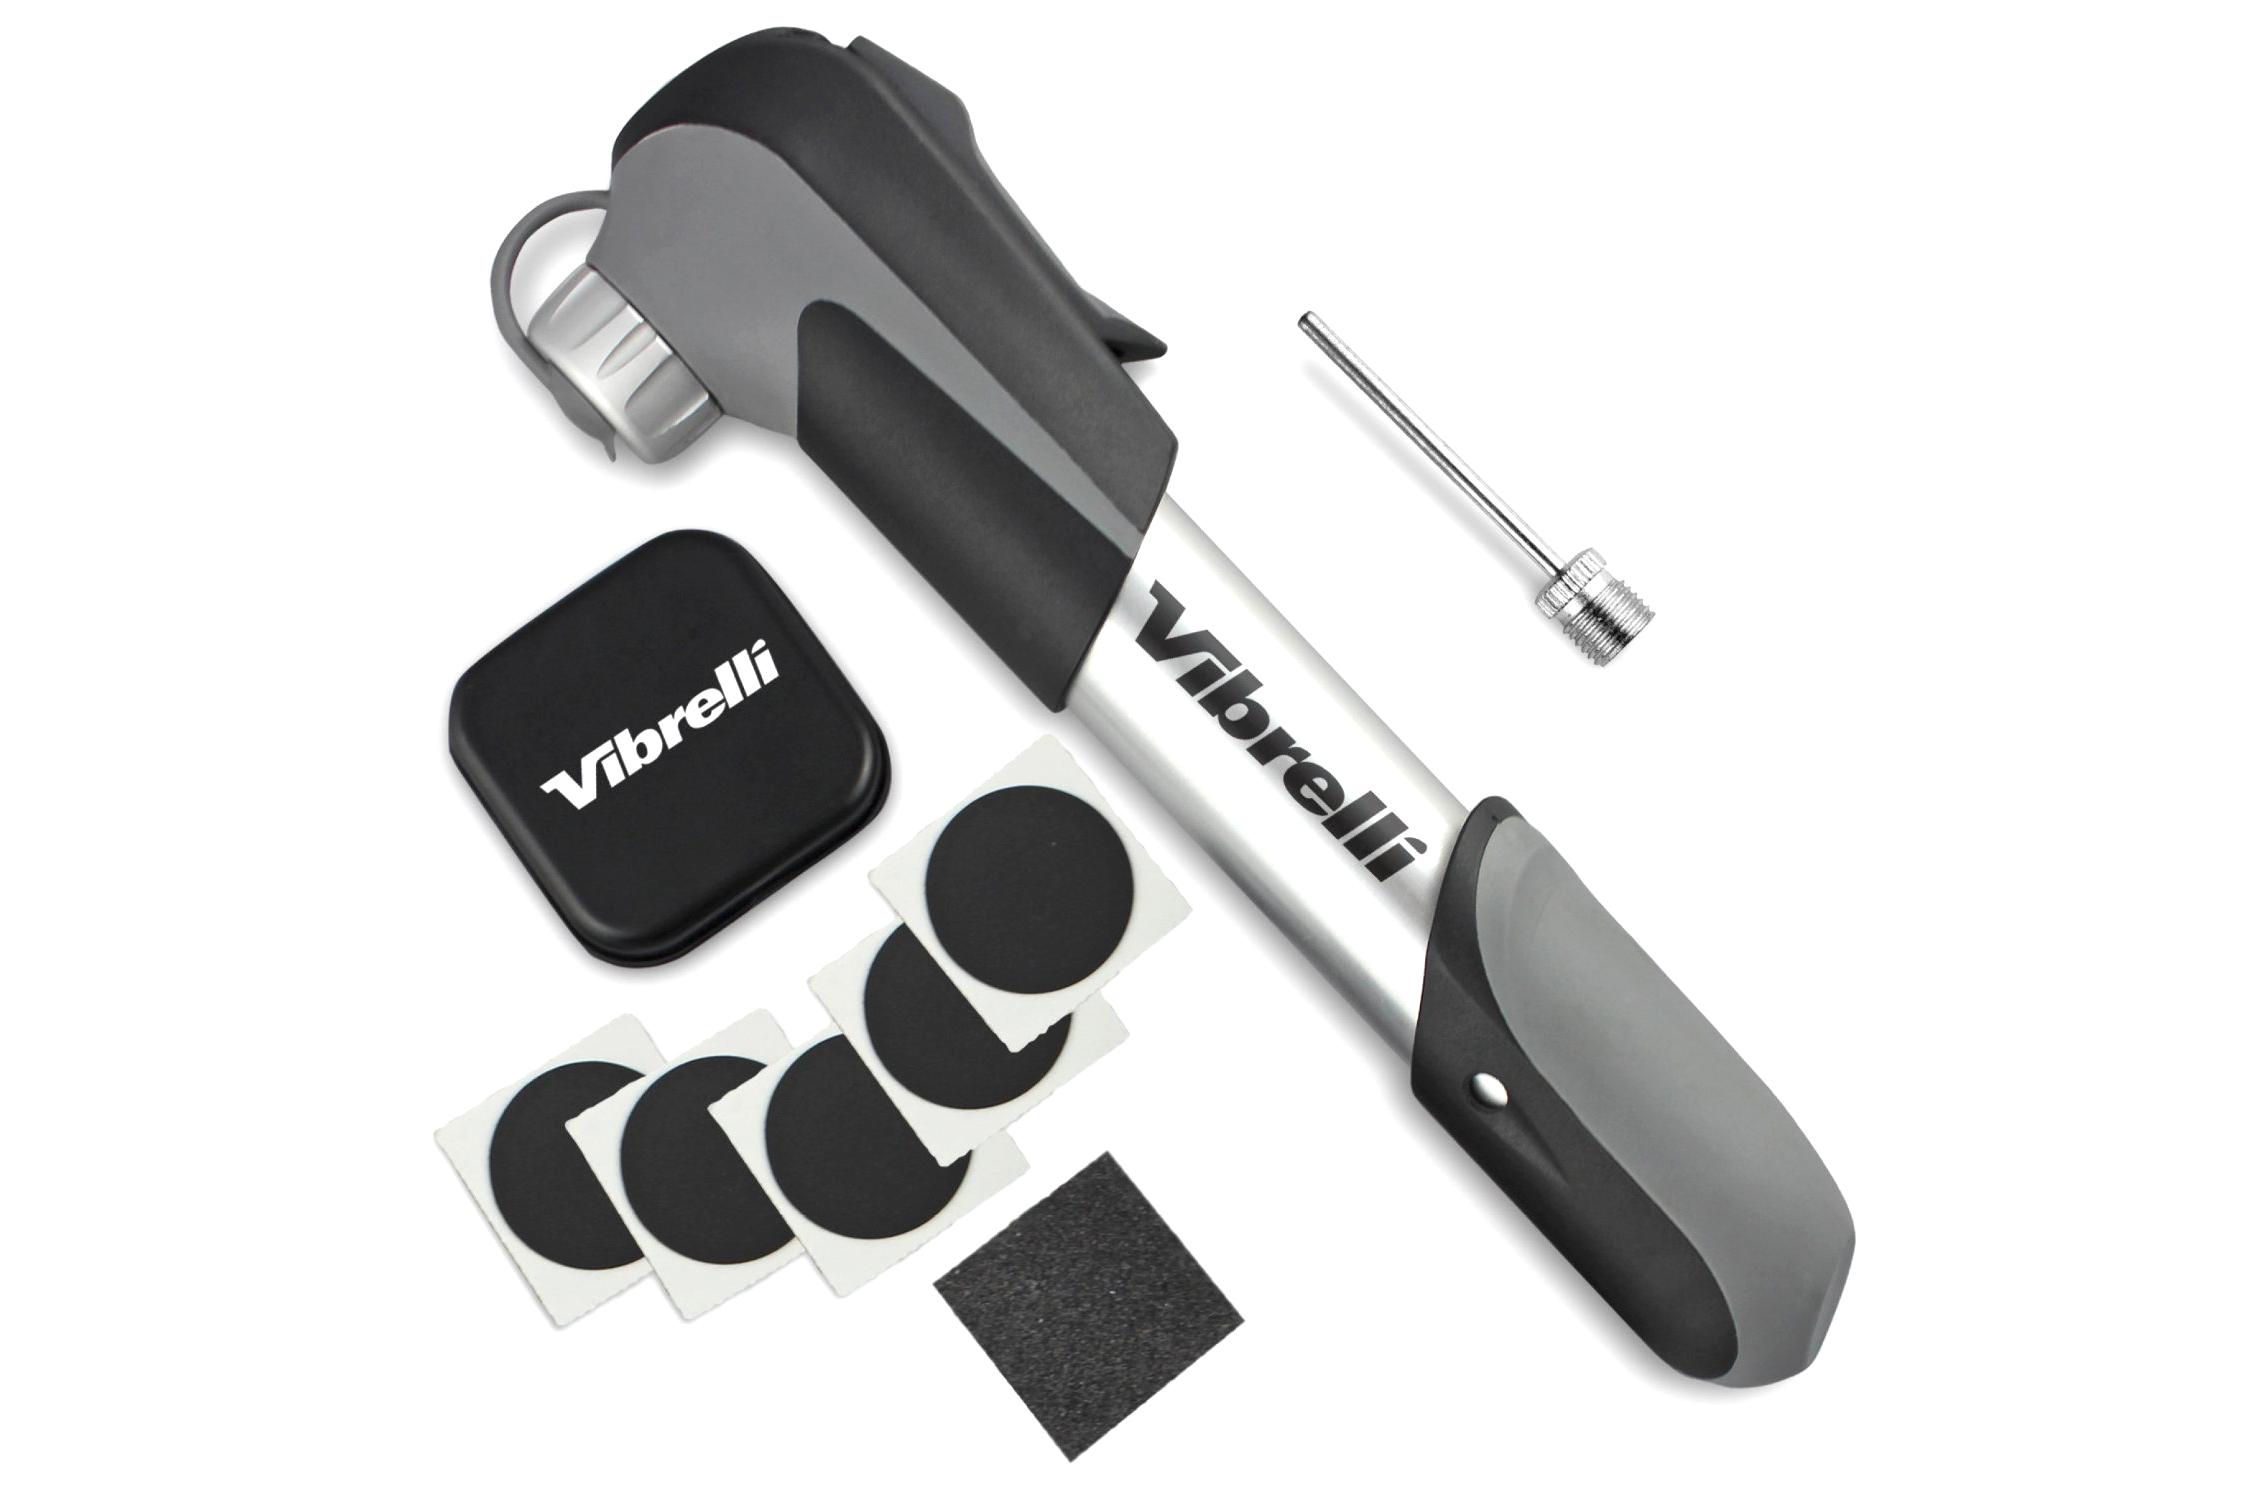 Flat Tire Repair Kit, Incl Pump, Glueless Patches - 4.5 stars - $20 (Prime)